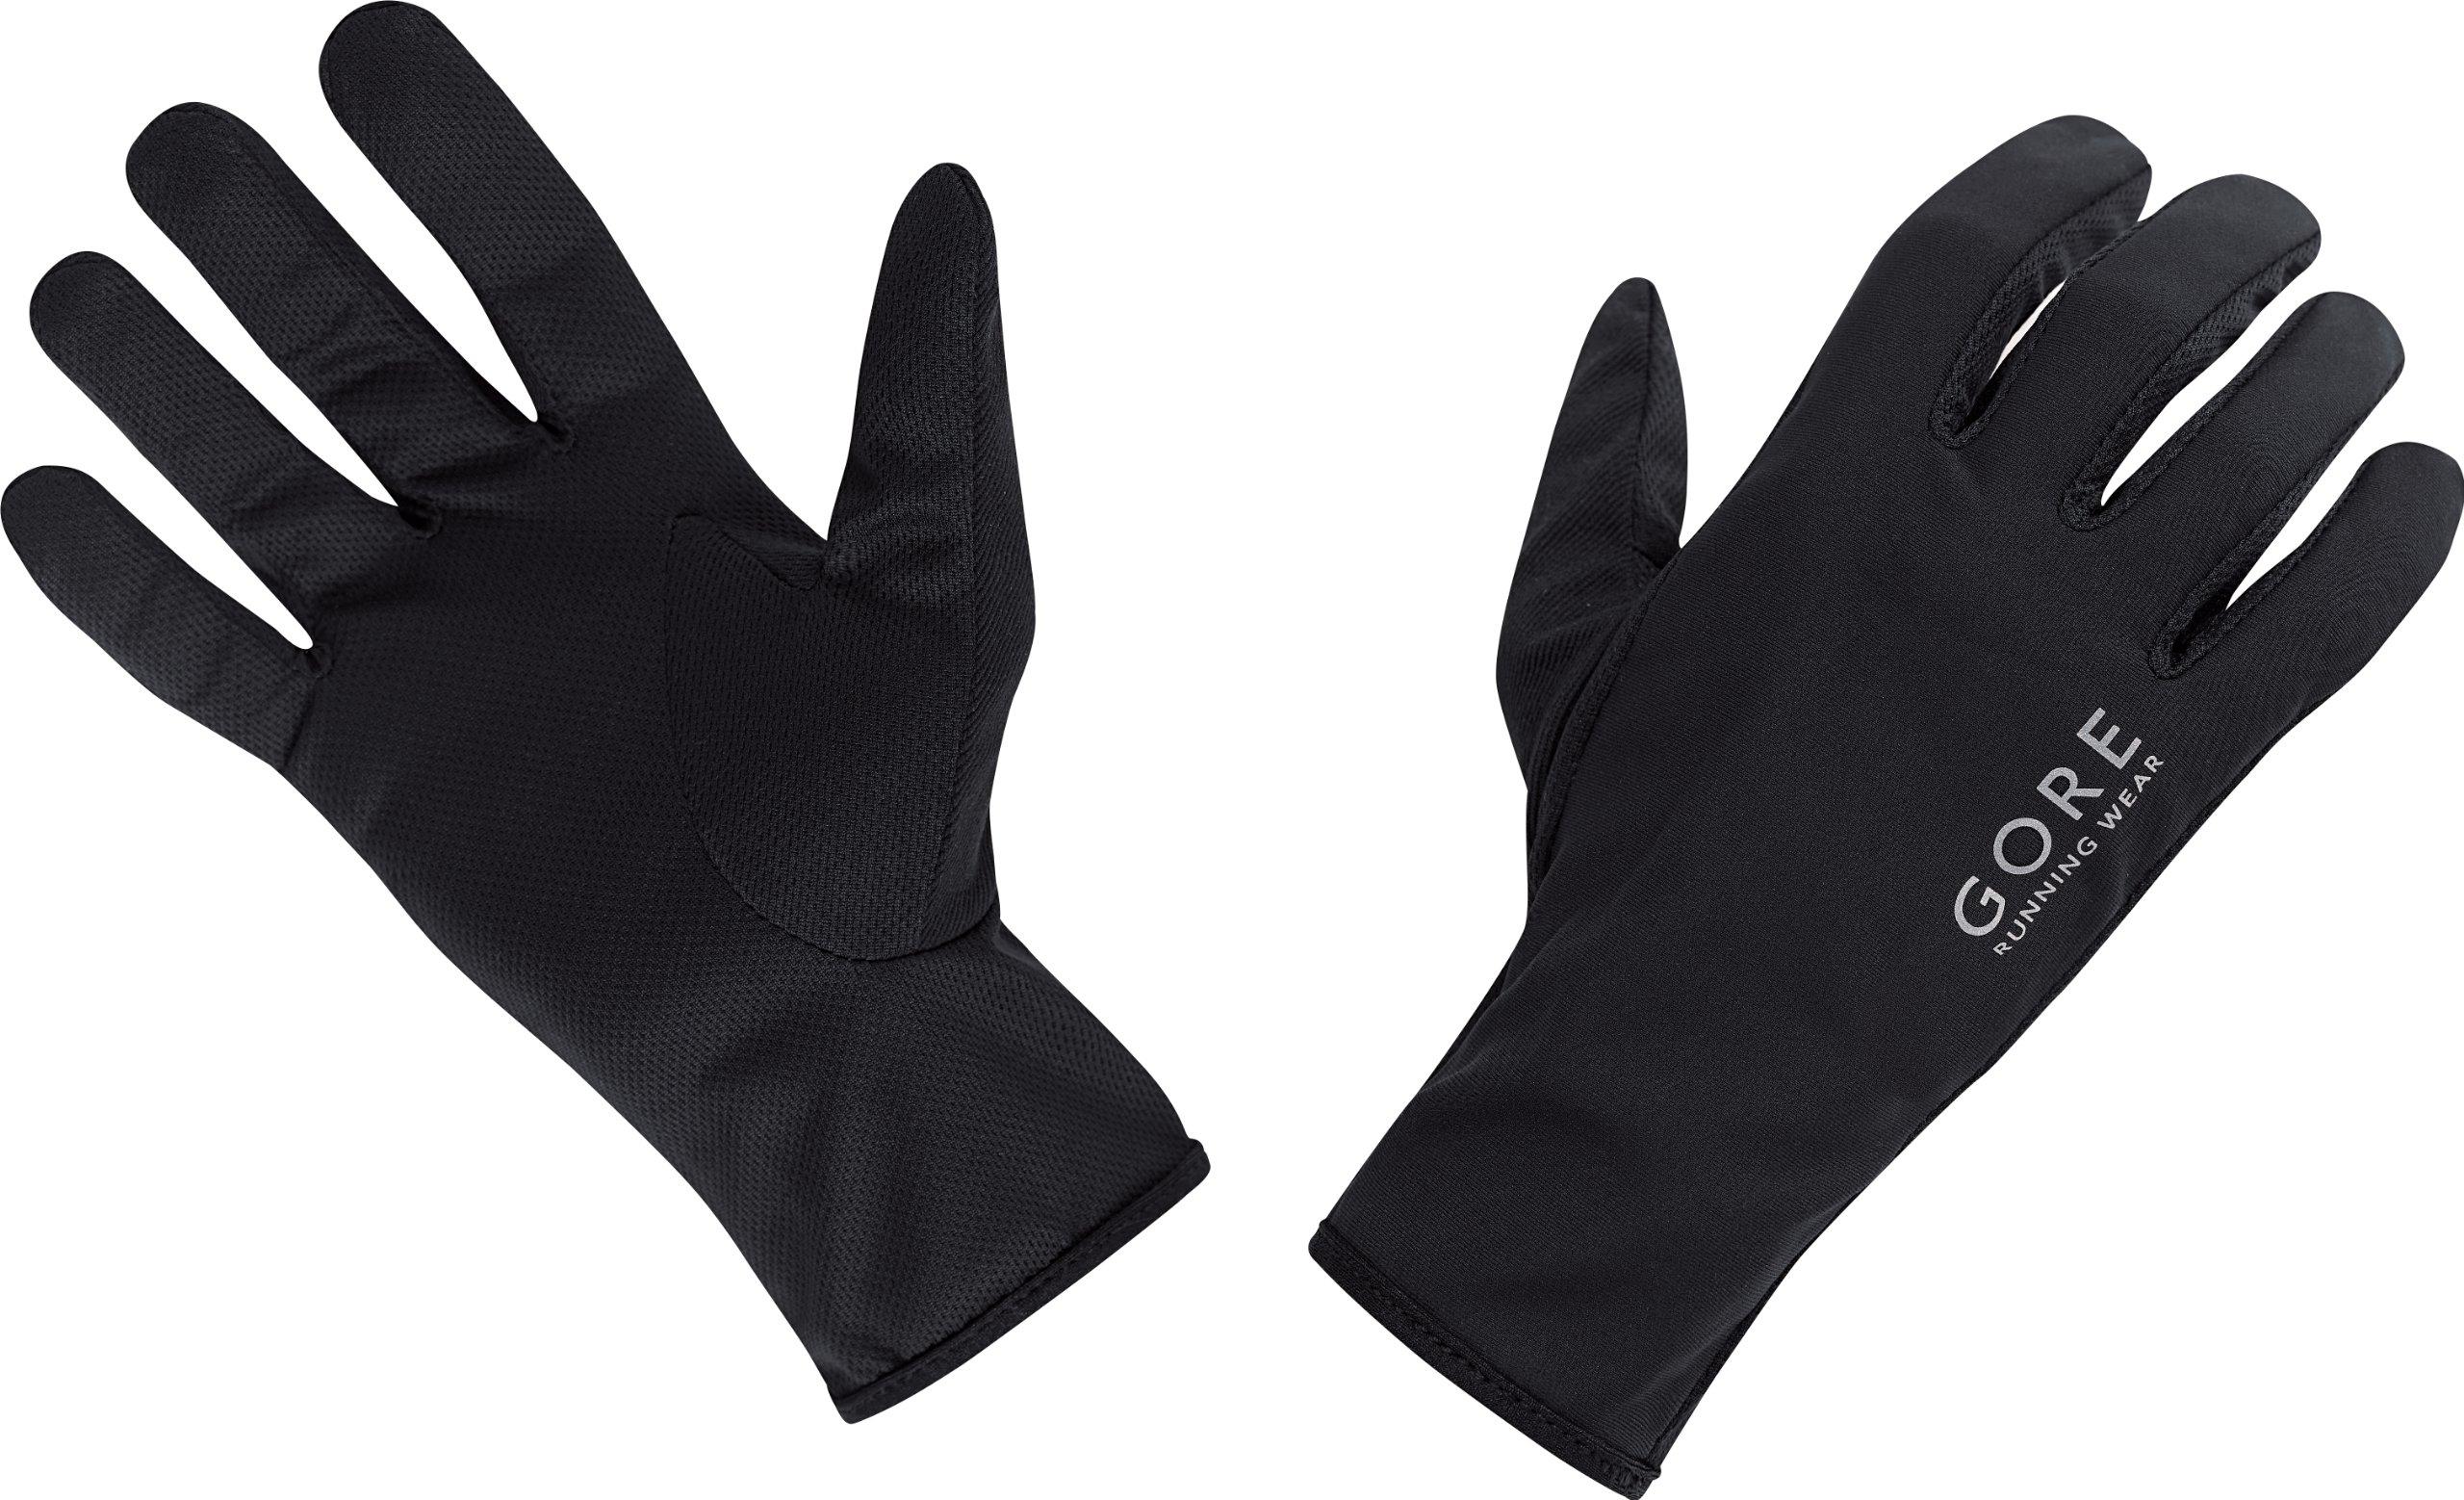 Gore Running Wear Guanti Air, Nero (black), 11